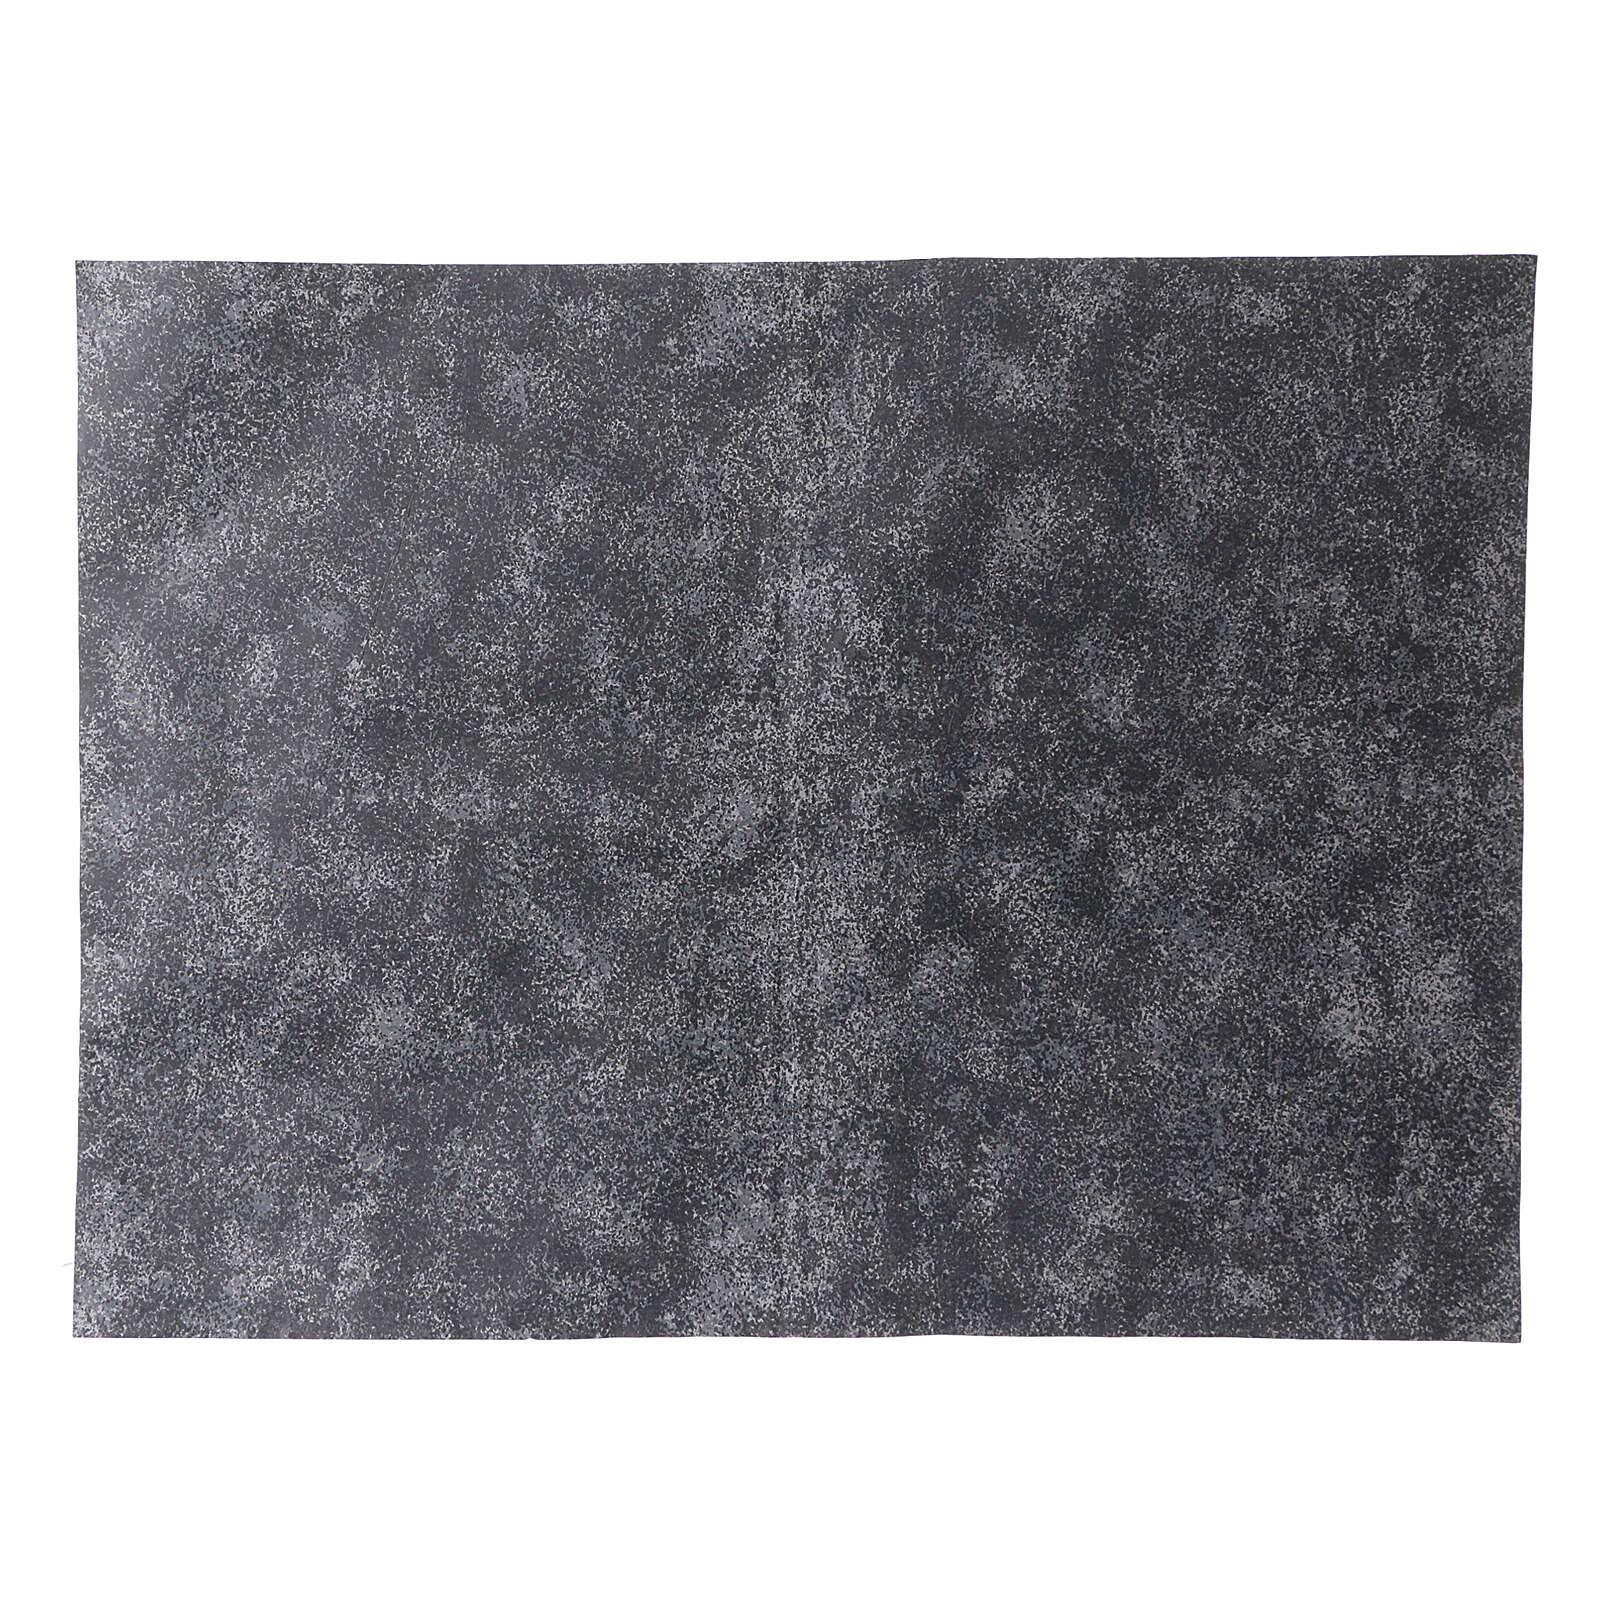 Nativity backdrop, rock grey paper 50x70 cm 4